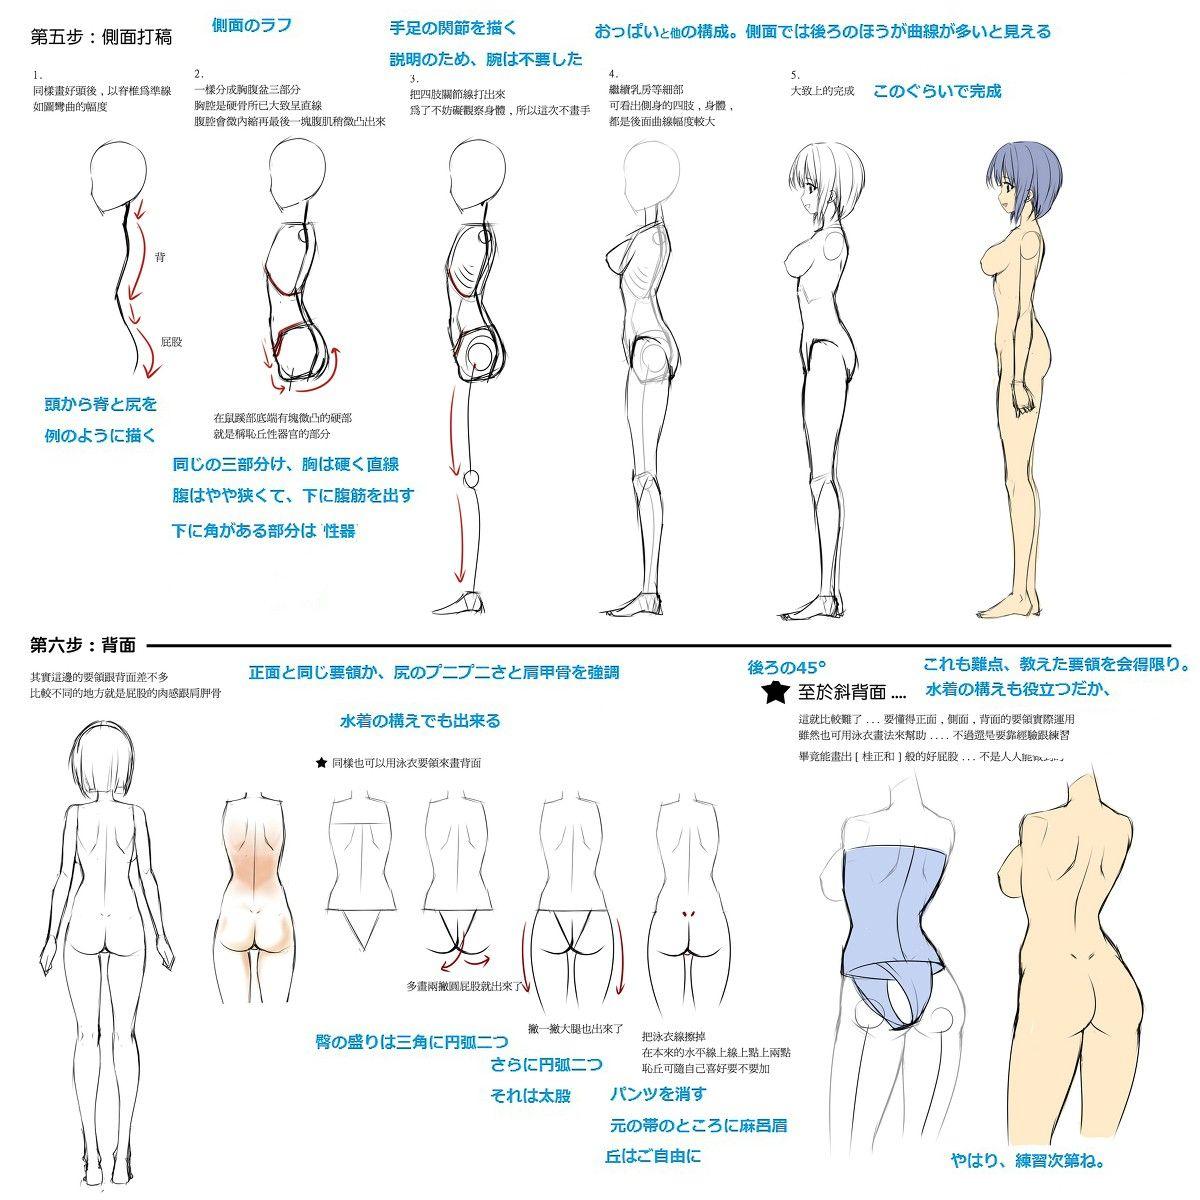 Dibujar anime, perfil y de espalda | anatomy | Pinterest | Art ...